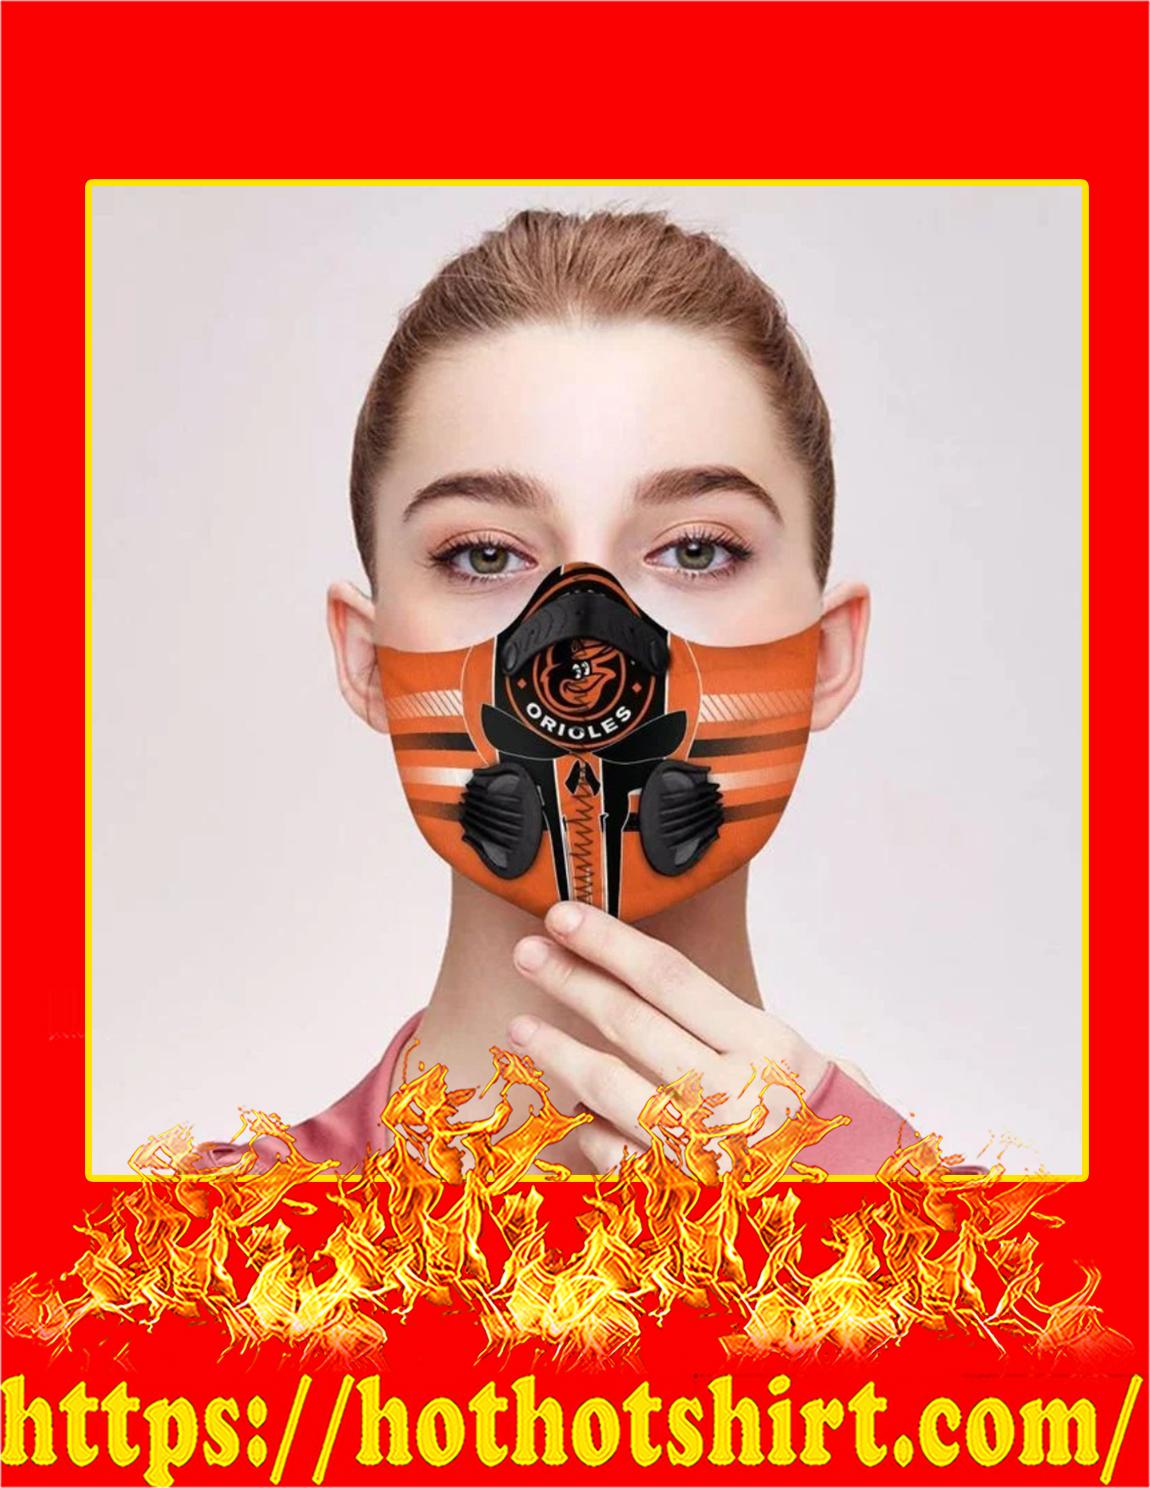 Baltimore orioles punisher skull filter face mask - Pic 1